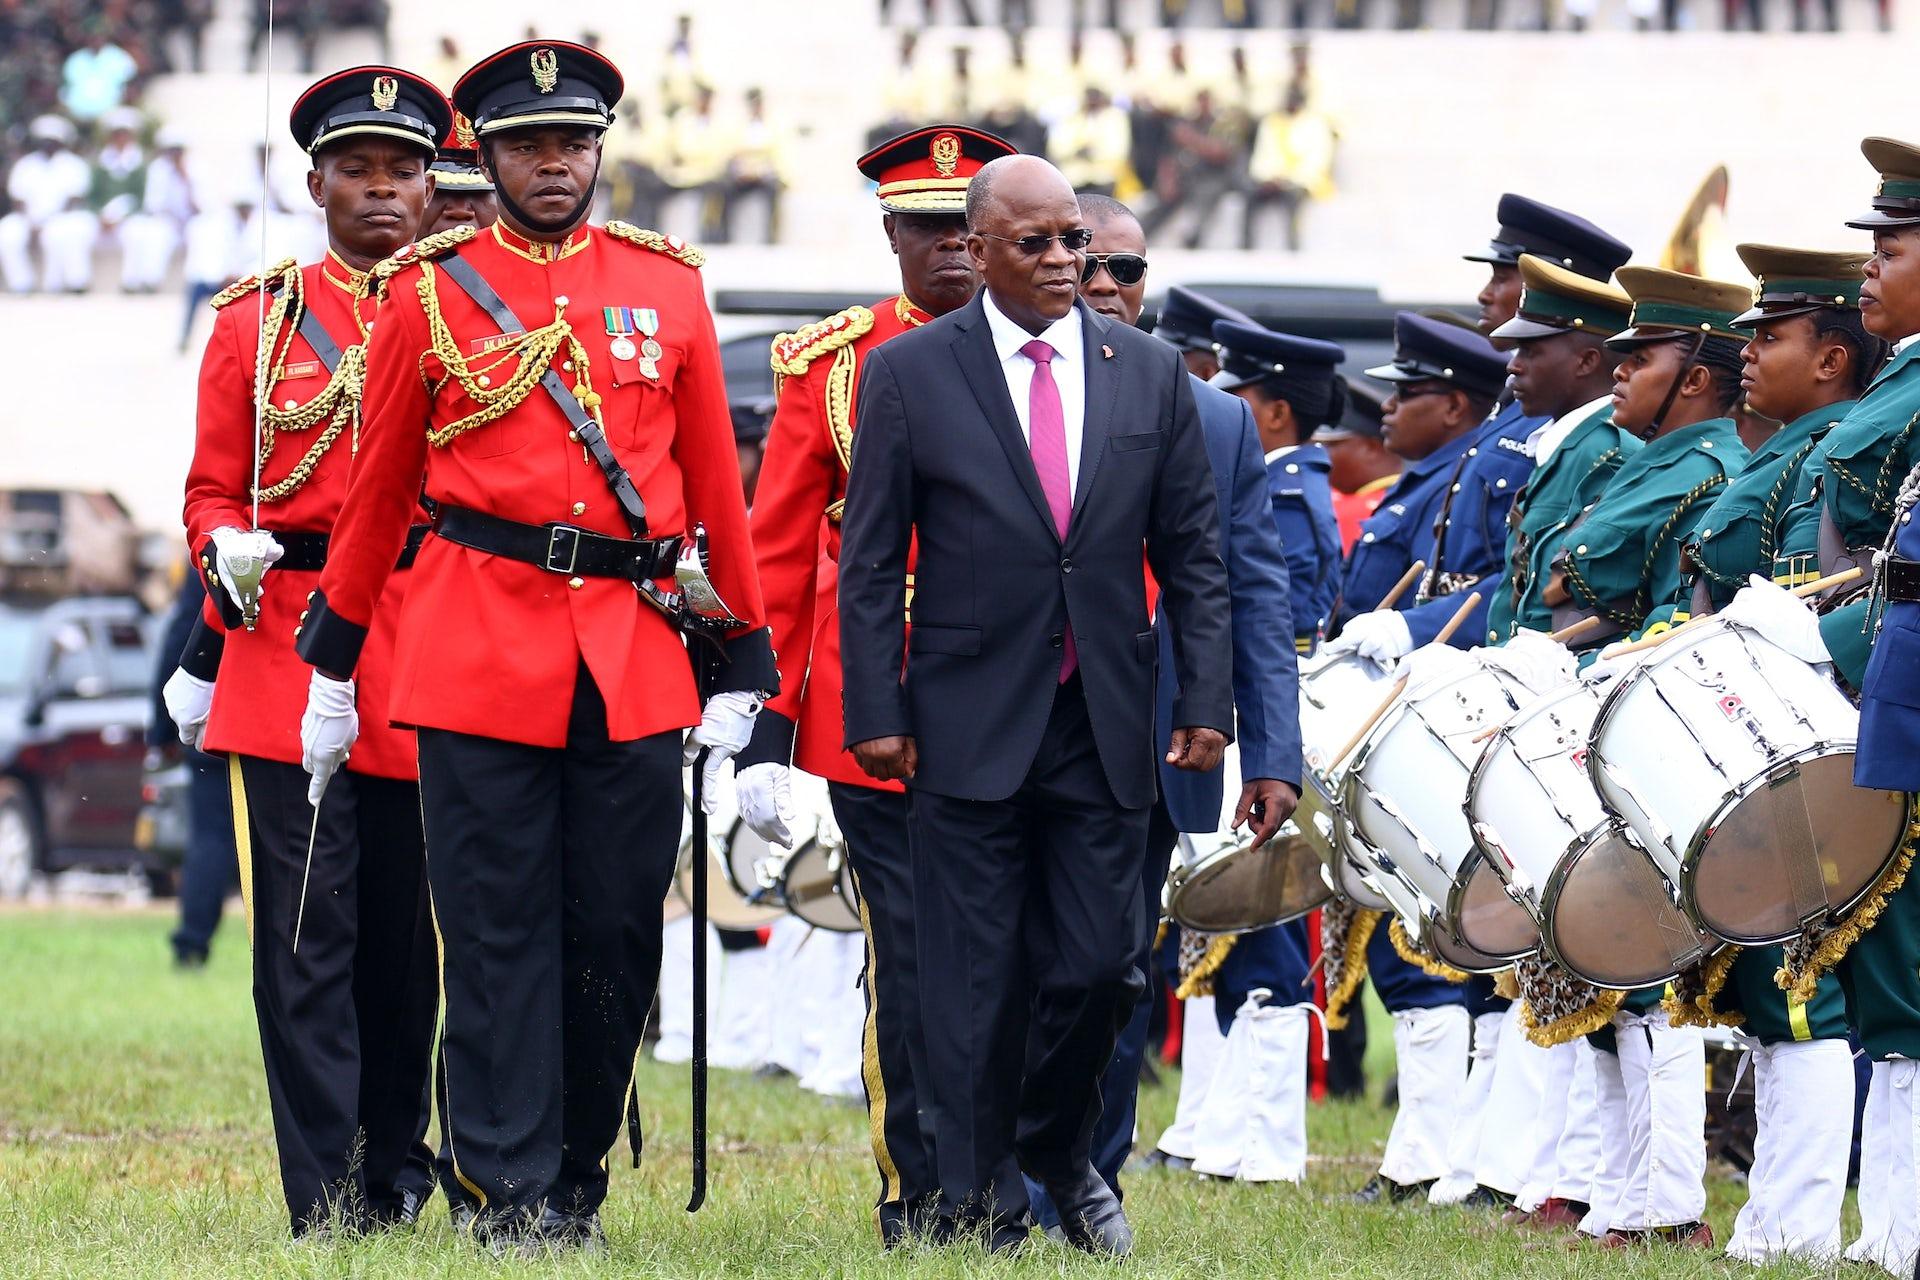 Tanzania's COVID-19 Response Puts Magufuli's Leadership Style in Sharp Relief